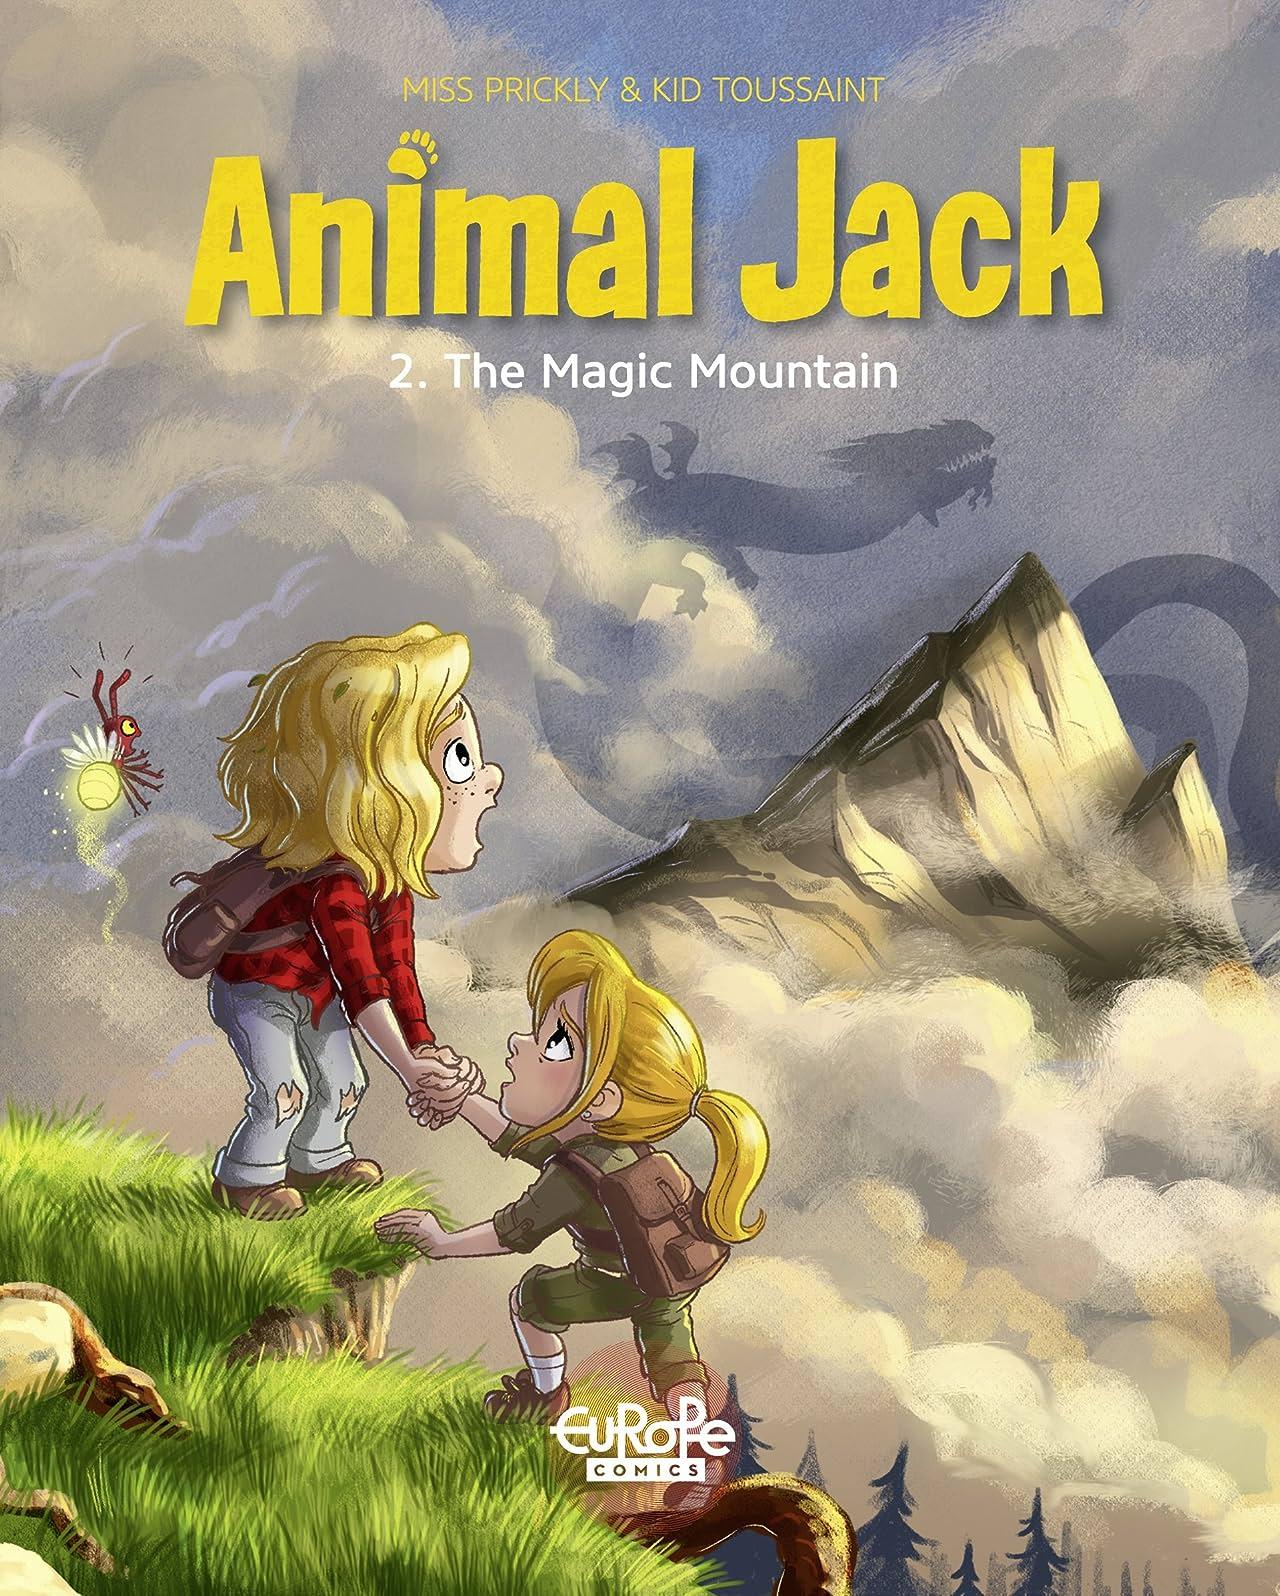 Animal Jack Vol. 2: The Magic Mountain